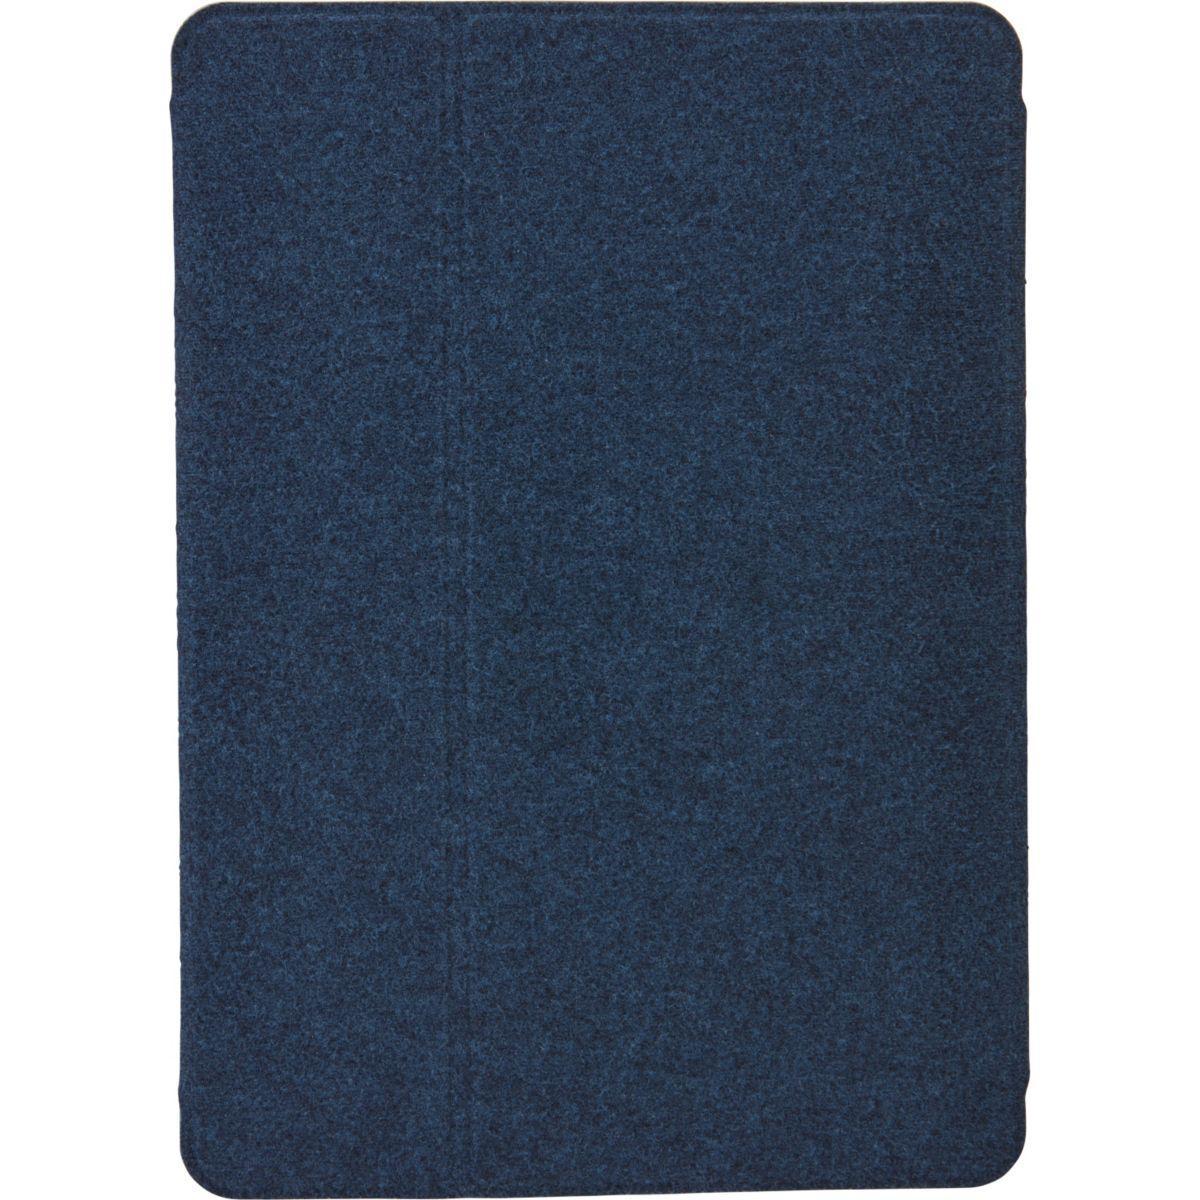 Etui tablette caselogic ipad pro 9.7 bleu ultra slim - livraison offerte : code premium (photo)